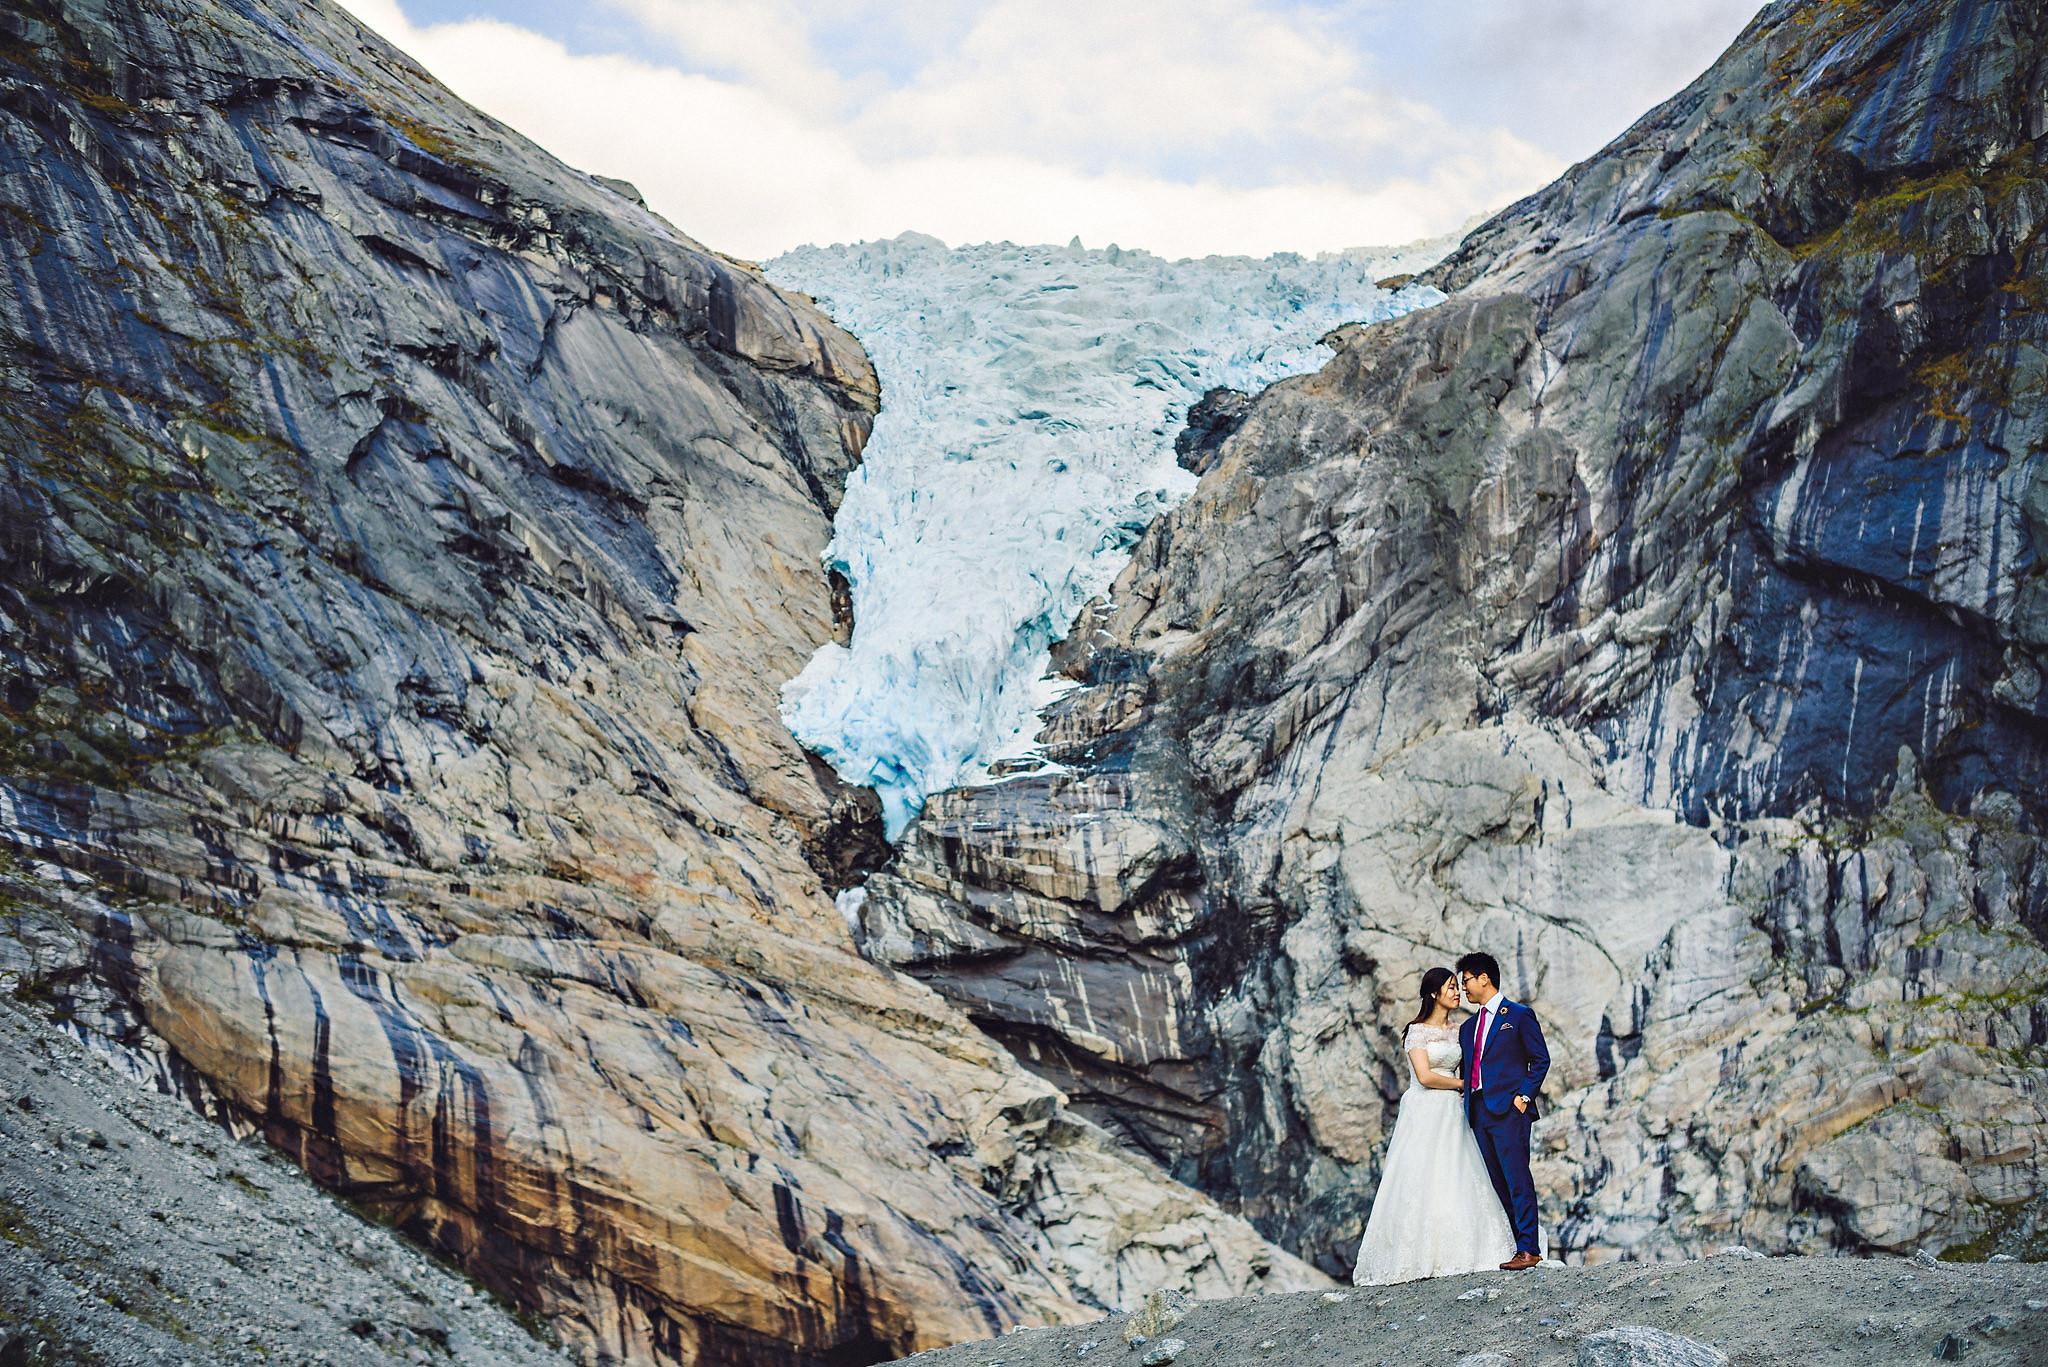 Bryllup på Yrineset i Oldedalen bryllupsfotograf sogn og fjordane-76.jpg